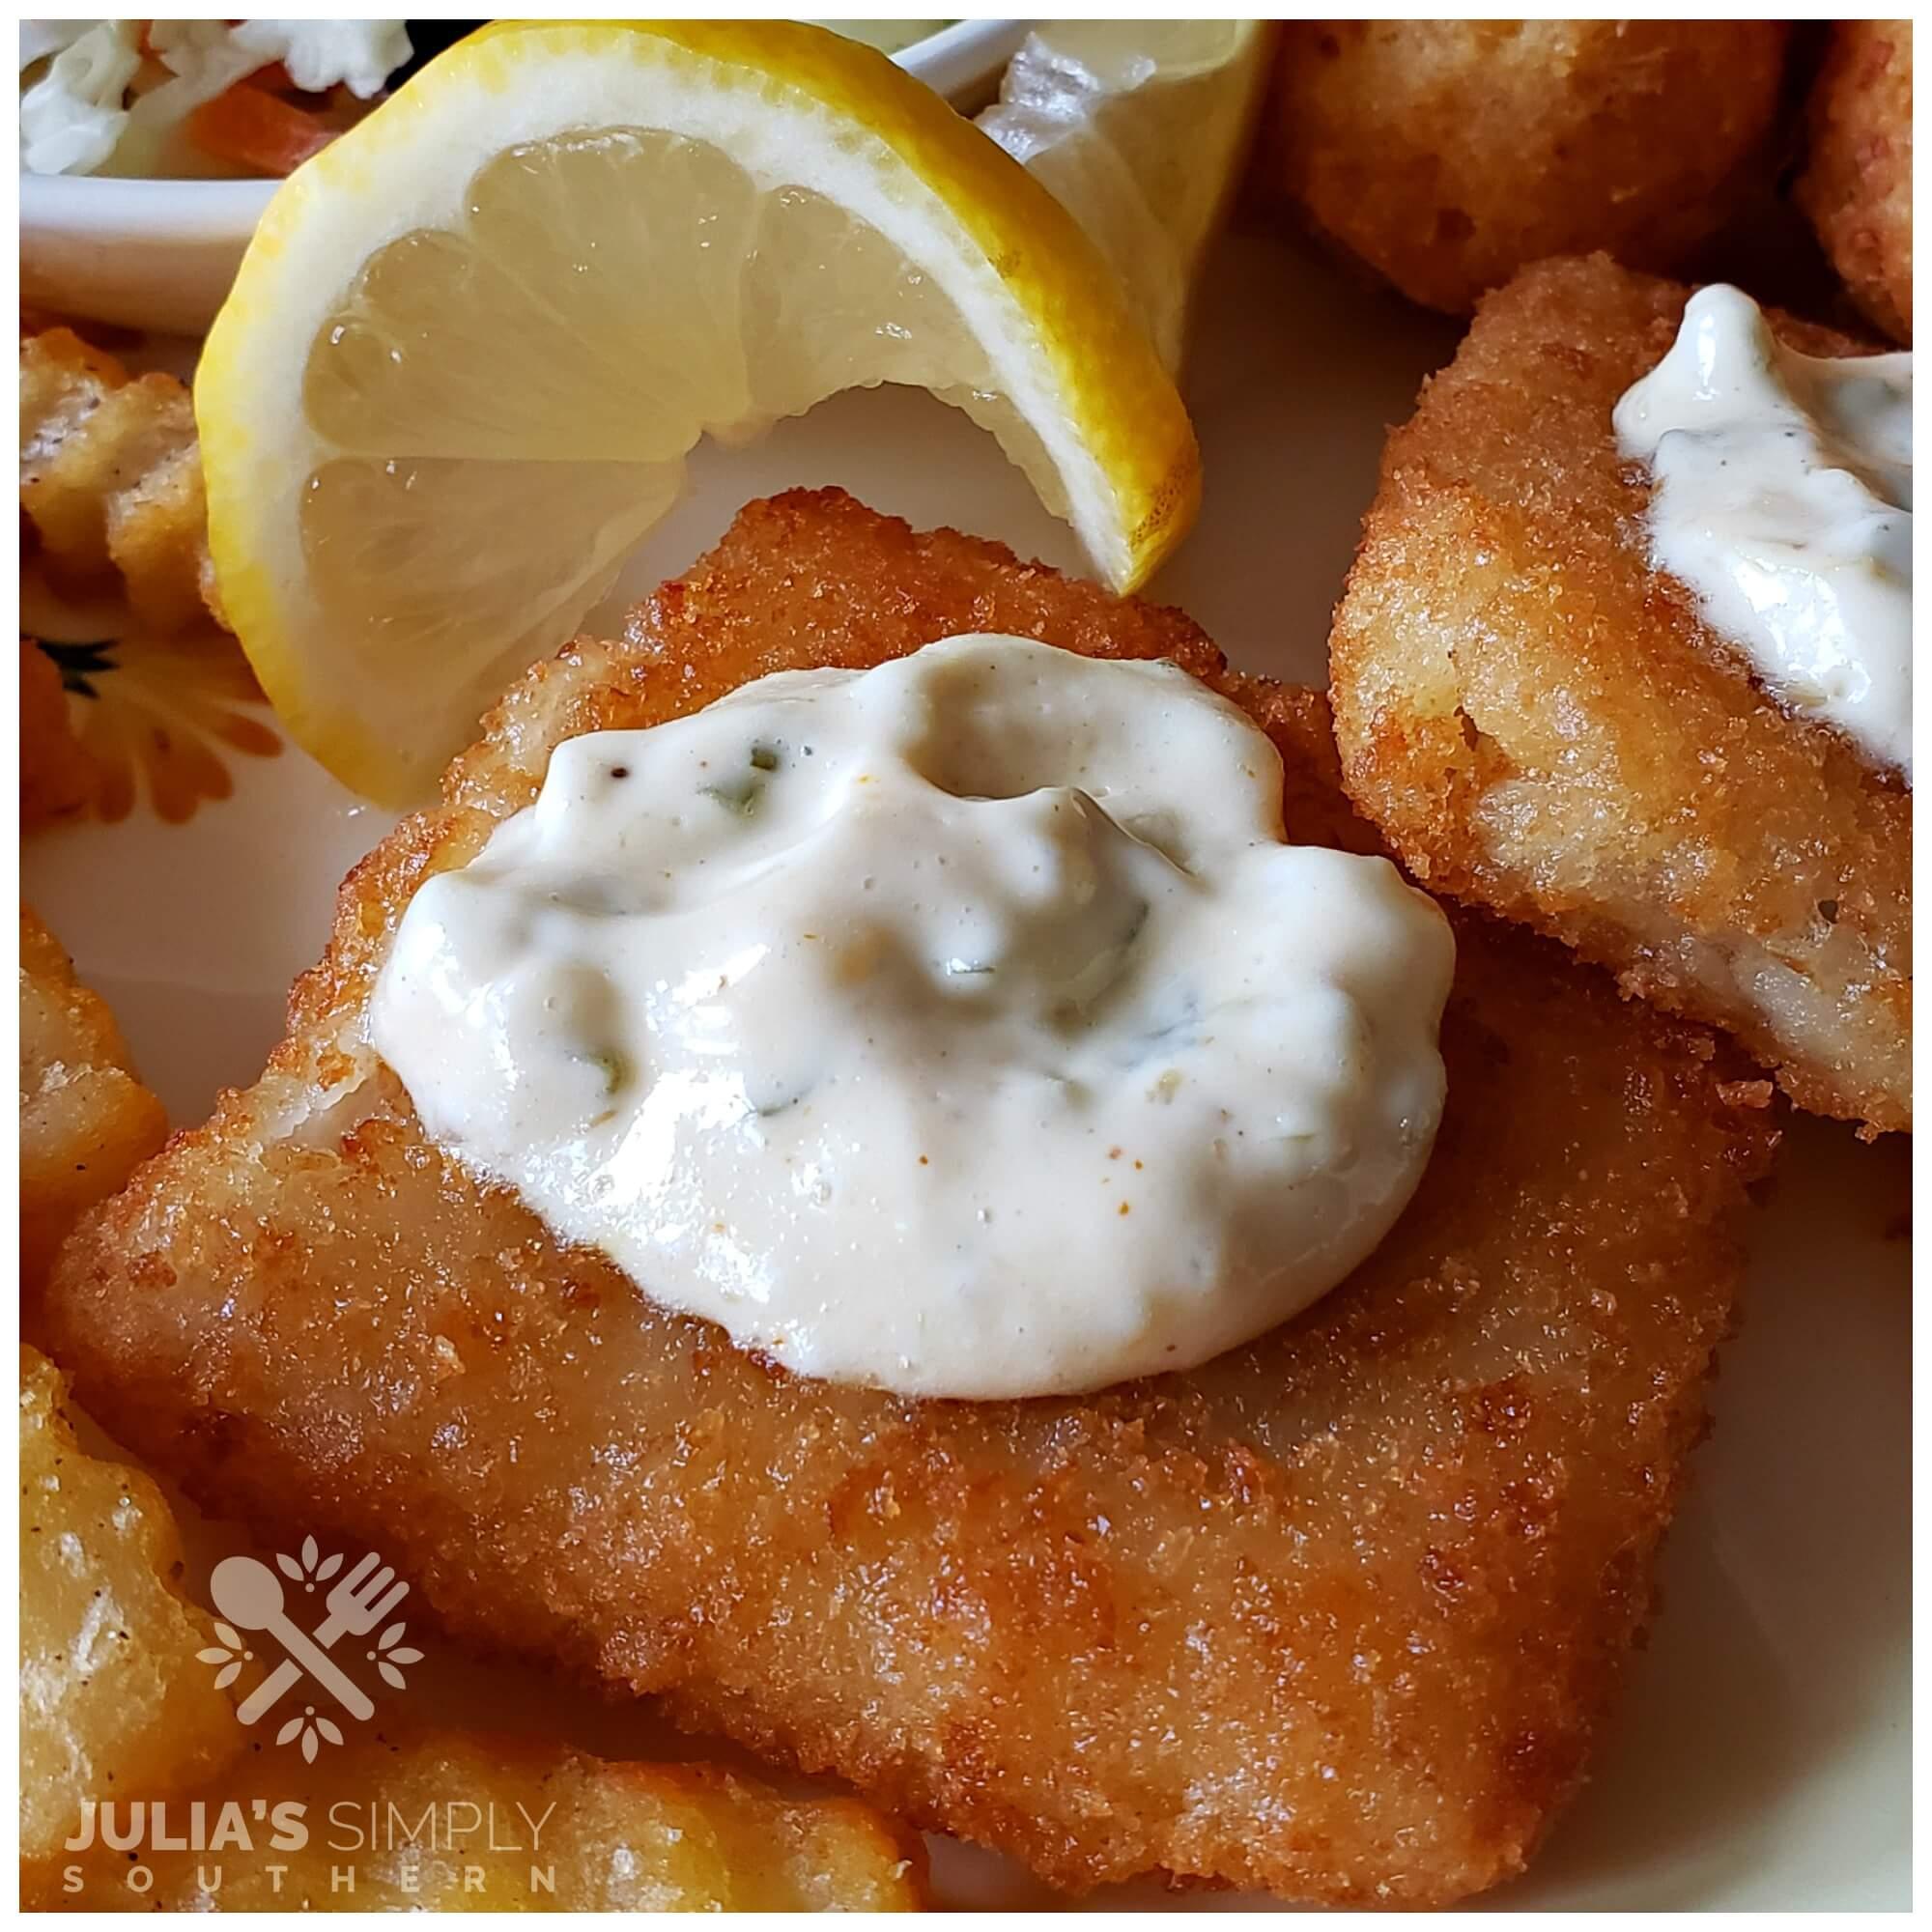 Southern tartar sauce on fried fish